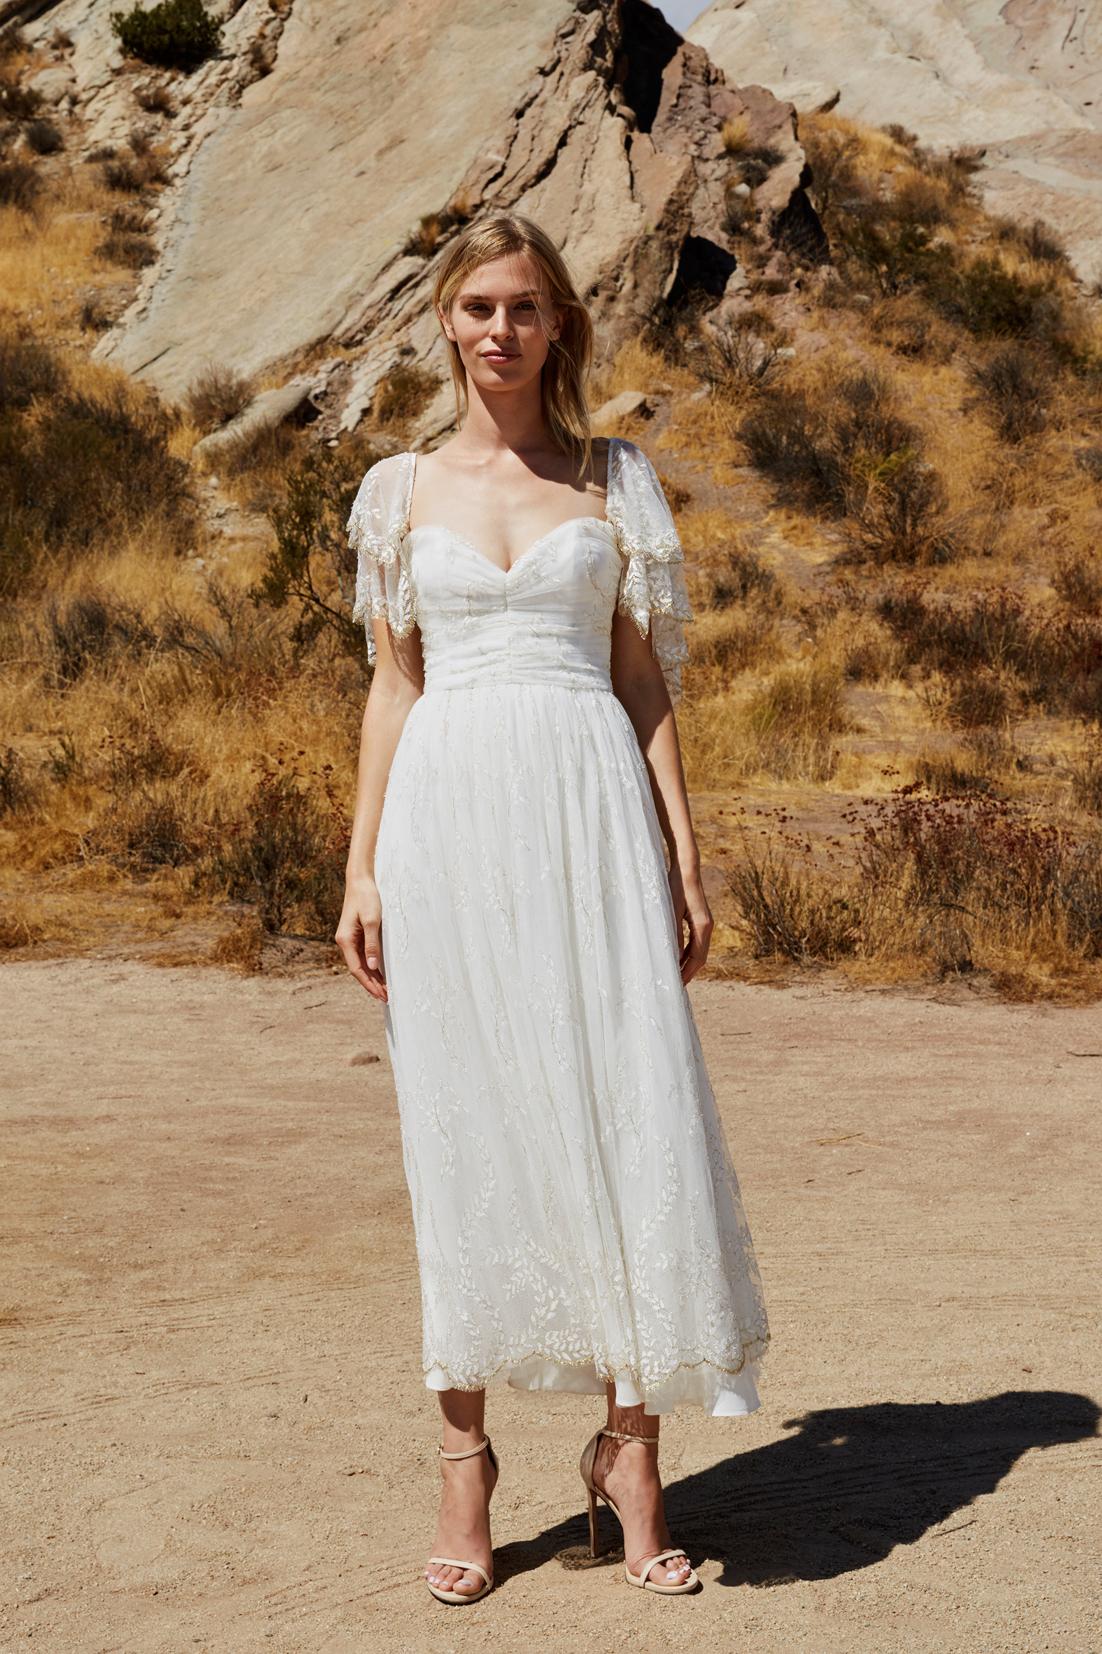 savannah miller fall 2018 sweetheart lace wedding dress